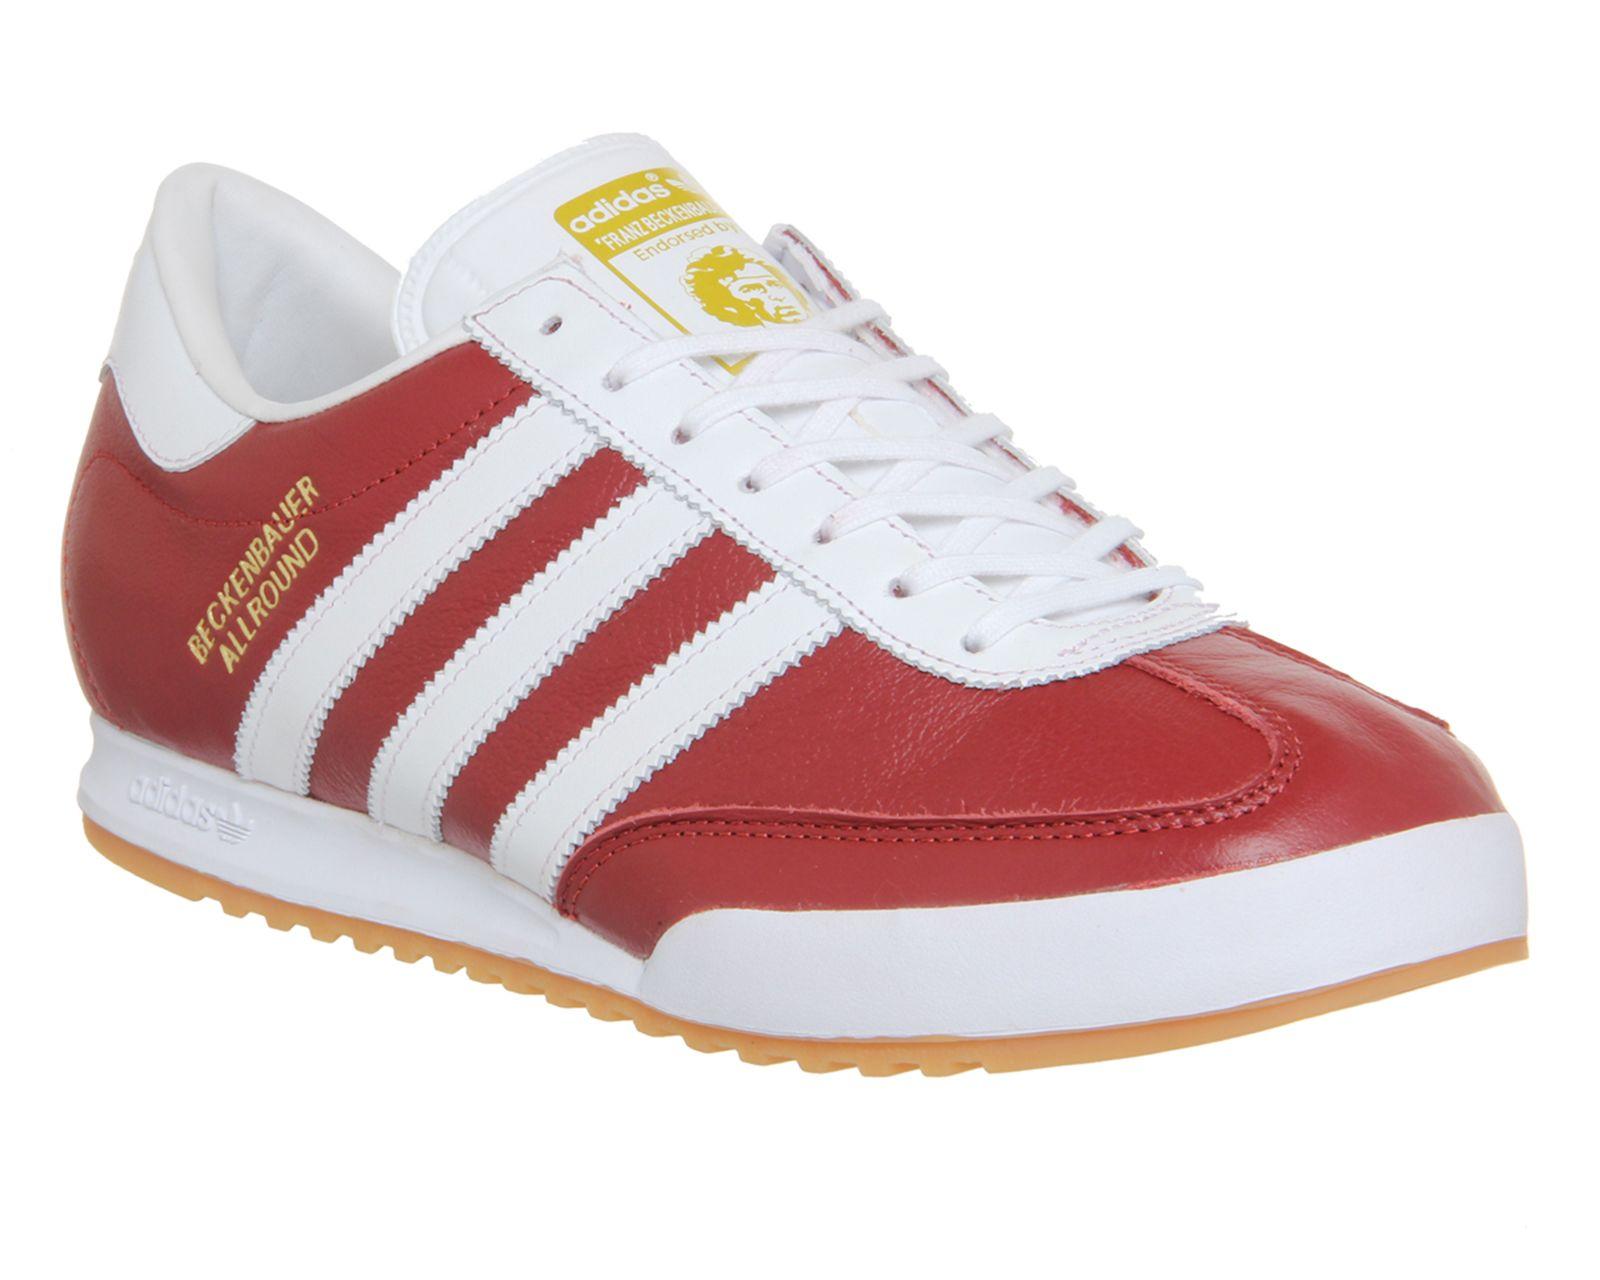 adidas beckenbauer allround shoes cheap online